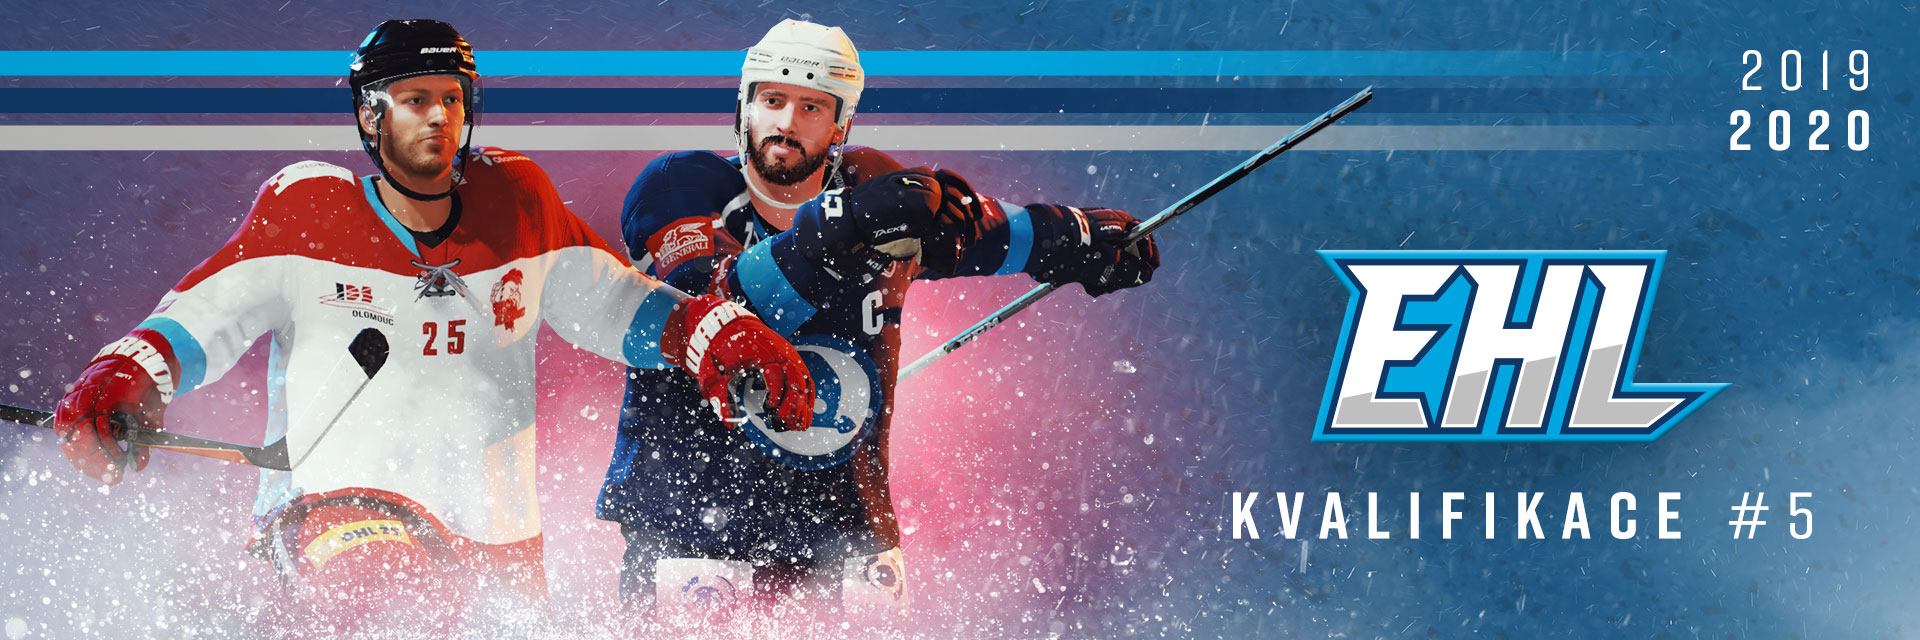 esport-hokejova-liga-kvalifikace-5